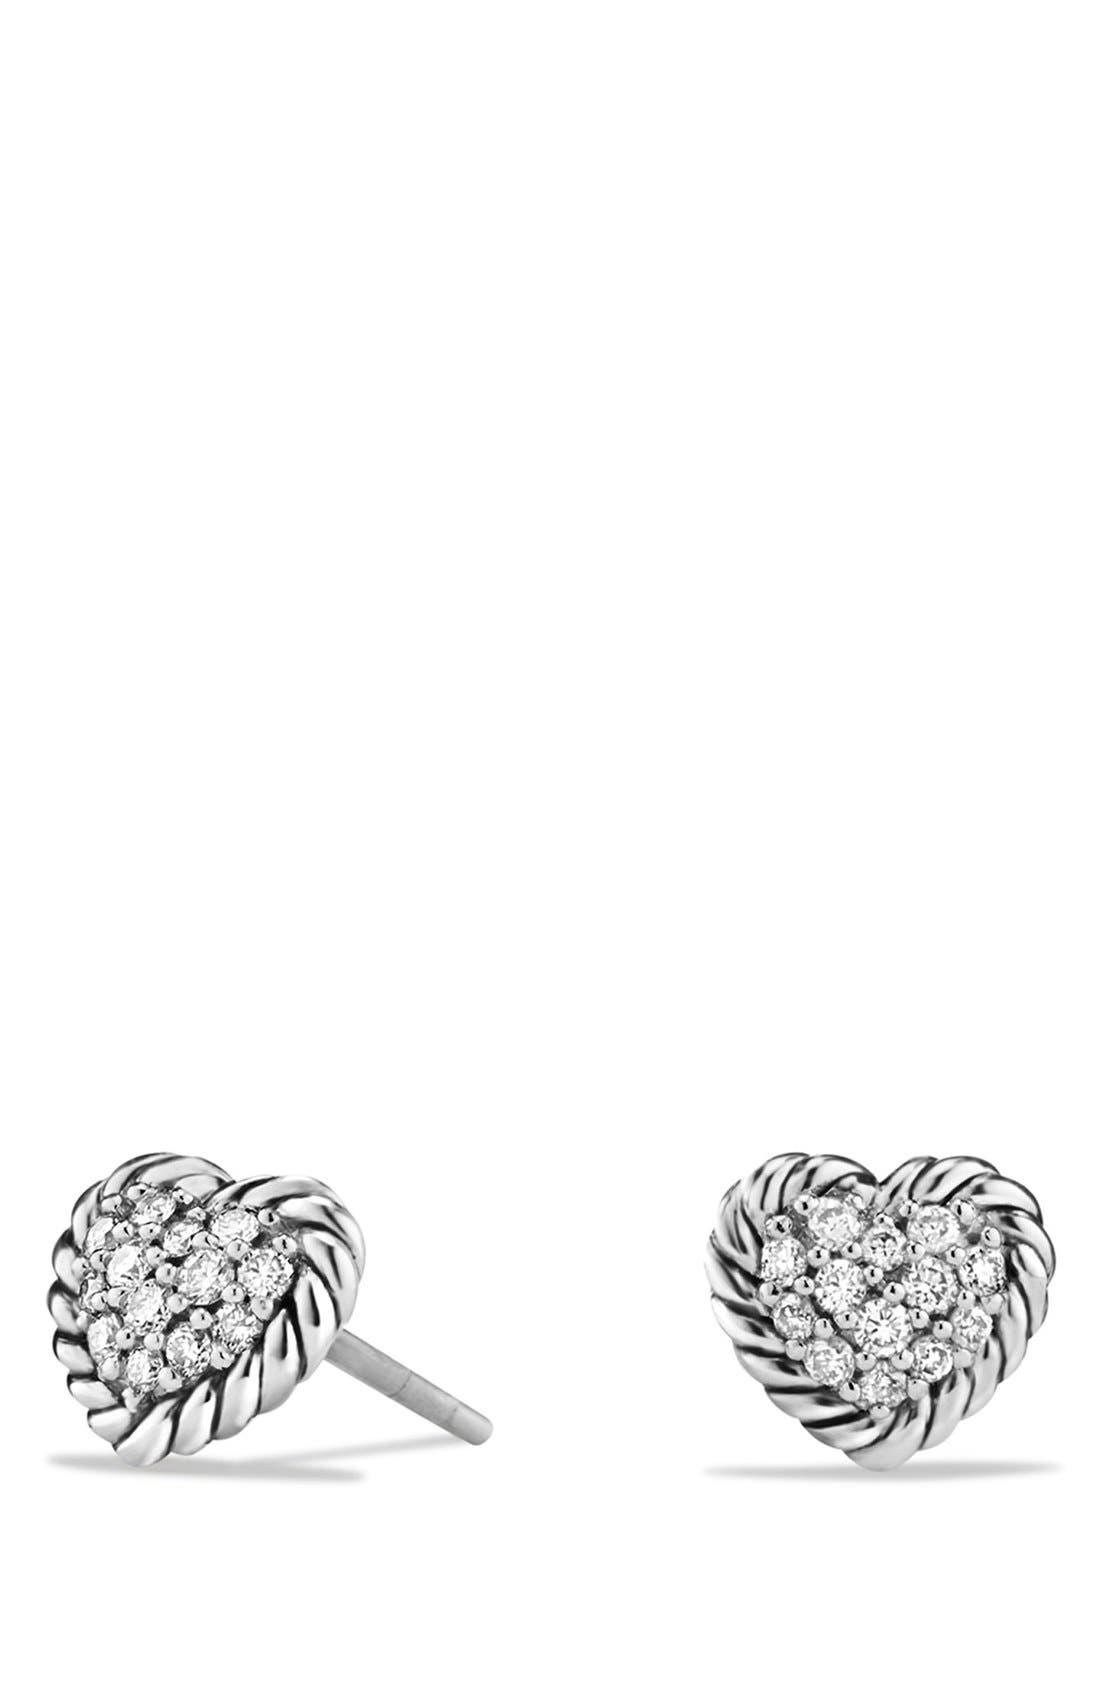 Alternate Image 1 Selected - David Yurman 'Châtelaine' Heart Earrings with Diamonds